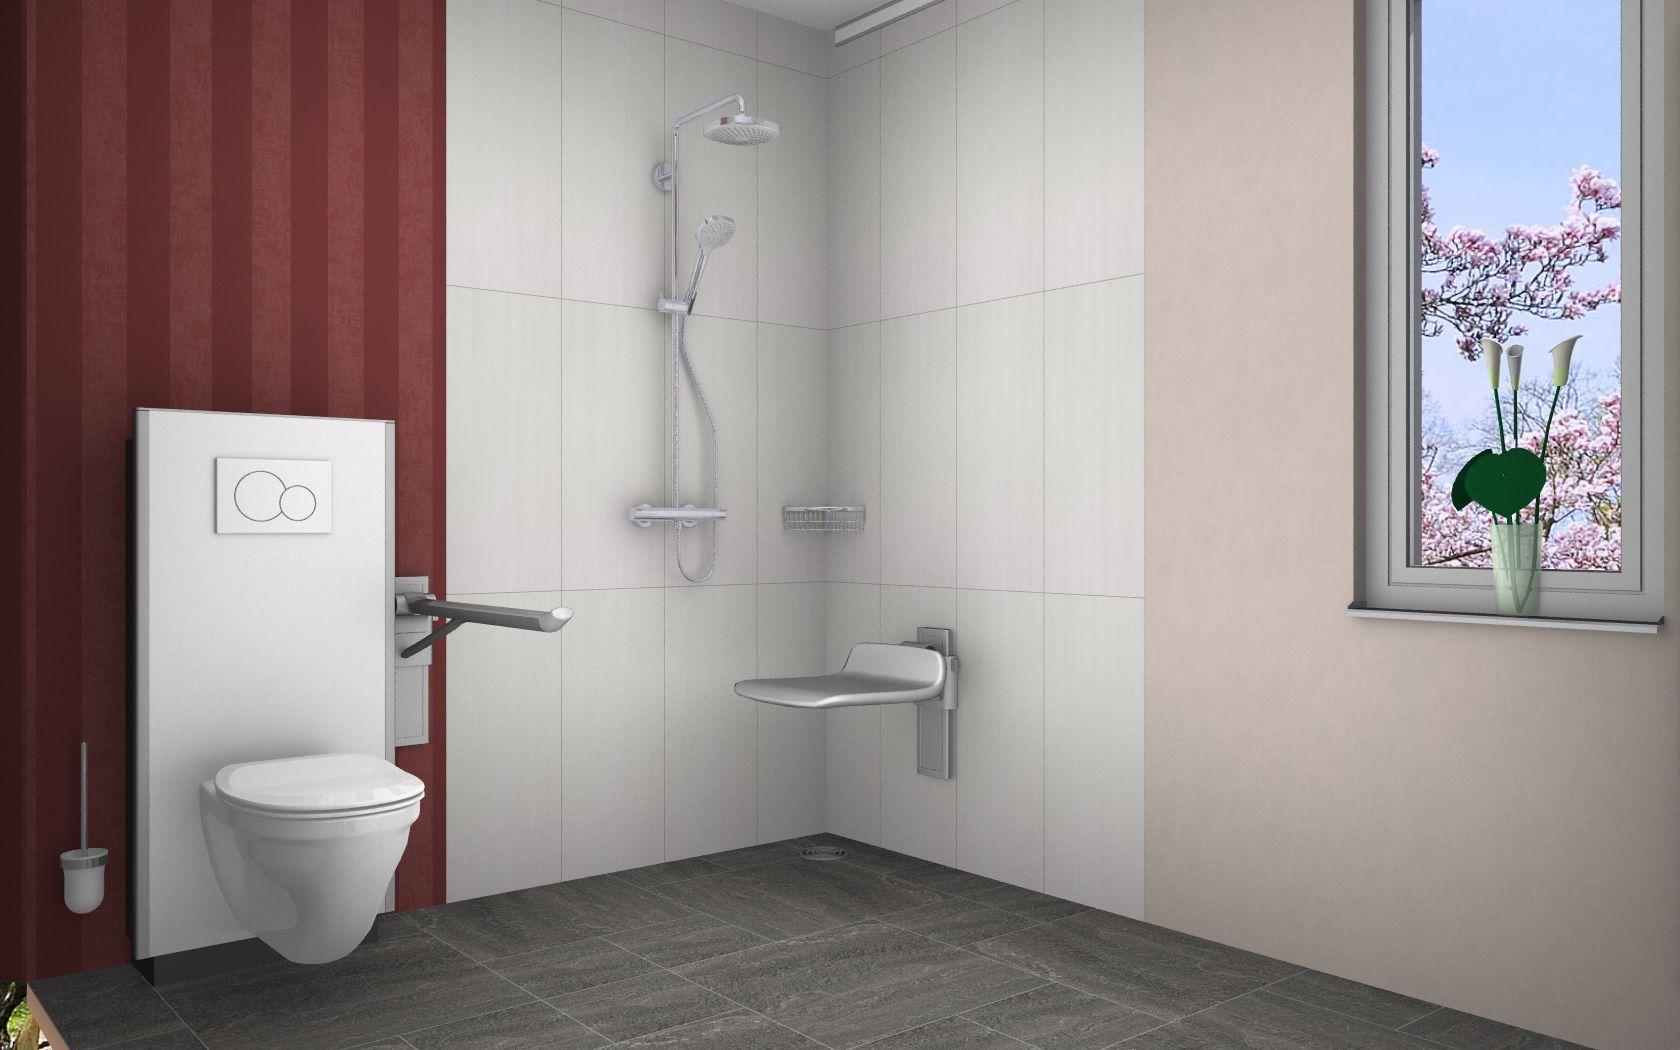 pressalit care r7420112 plus duschsitz 450 mit. Black Bedroom Furniture Sets. Home Design Ideas